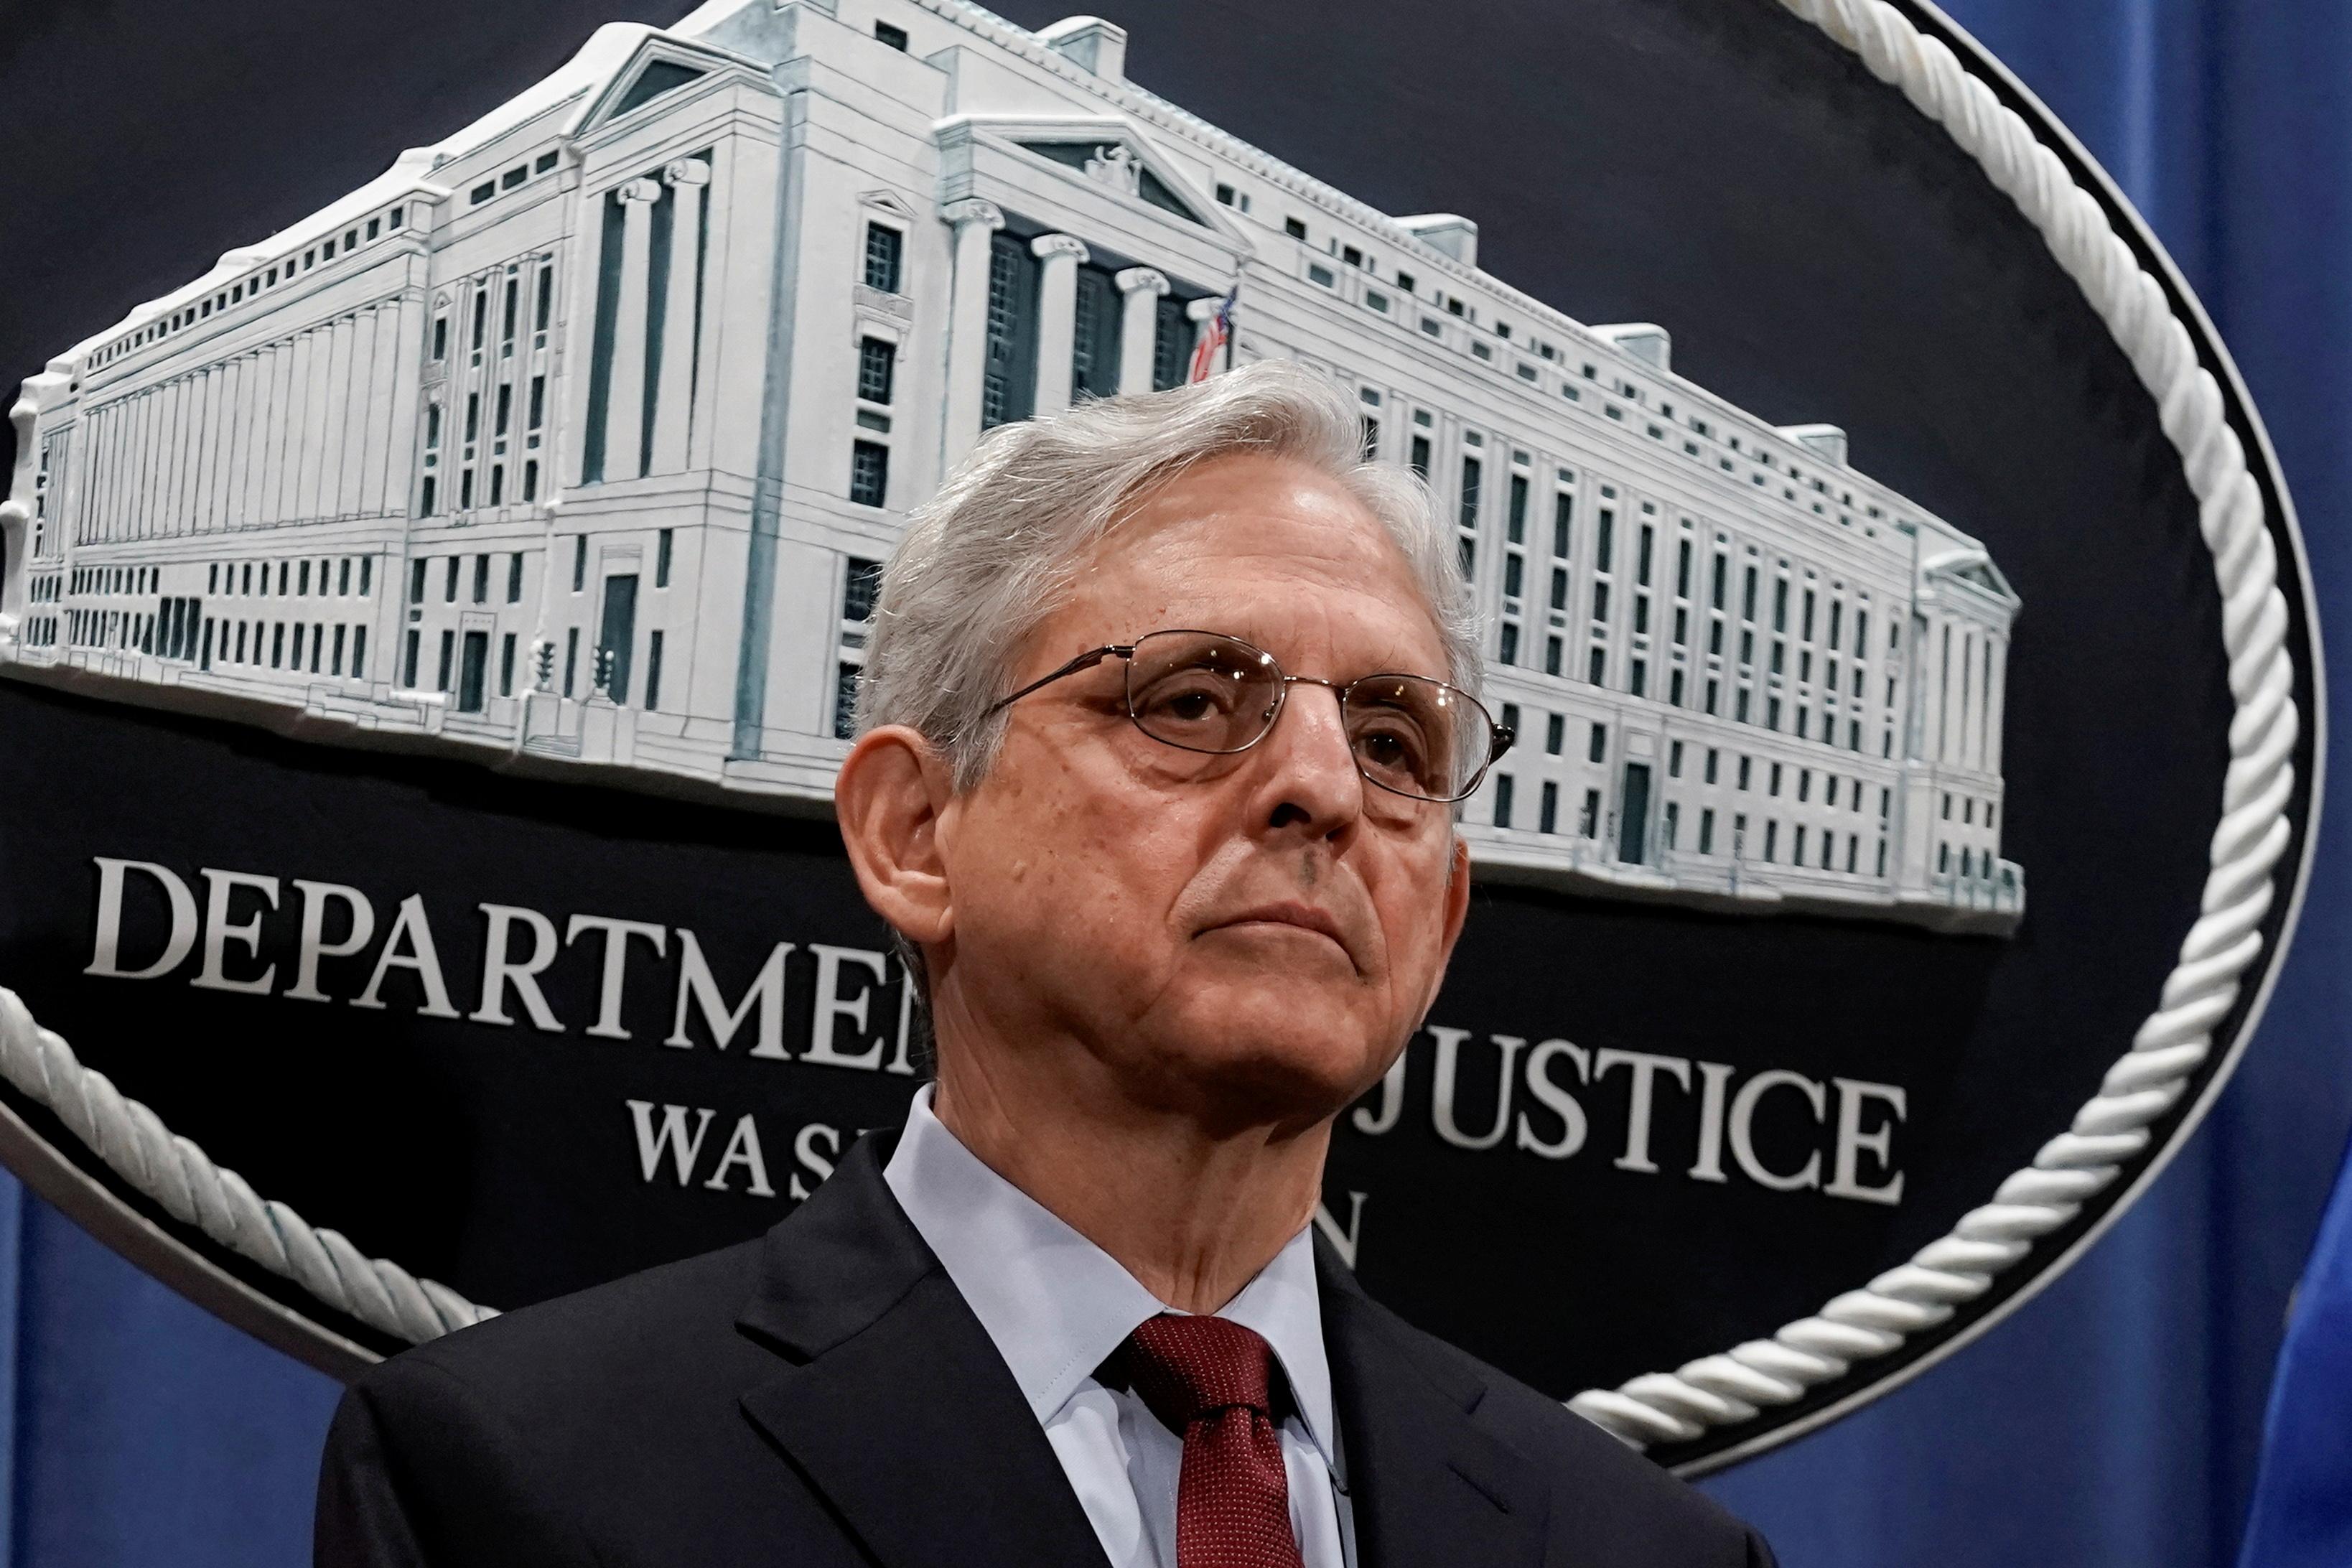 U.S. Attorney General Merrick Garland attends a news conference. REUTERS/Ken Cedeno